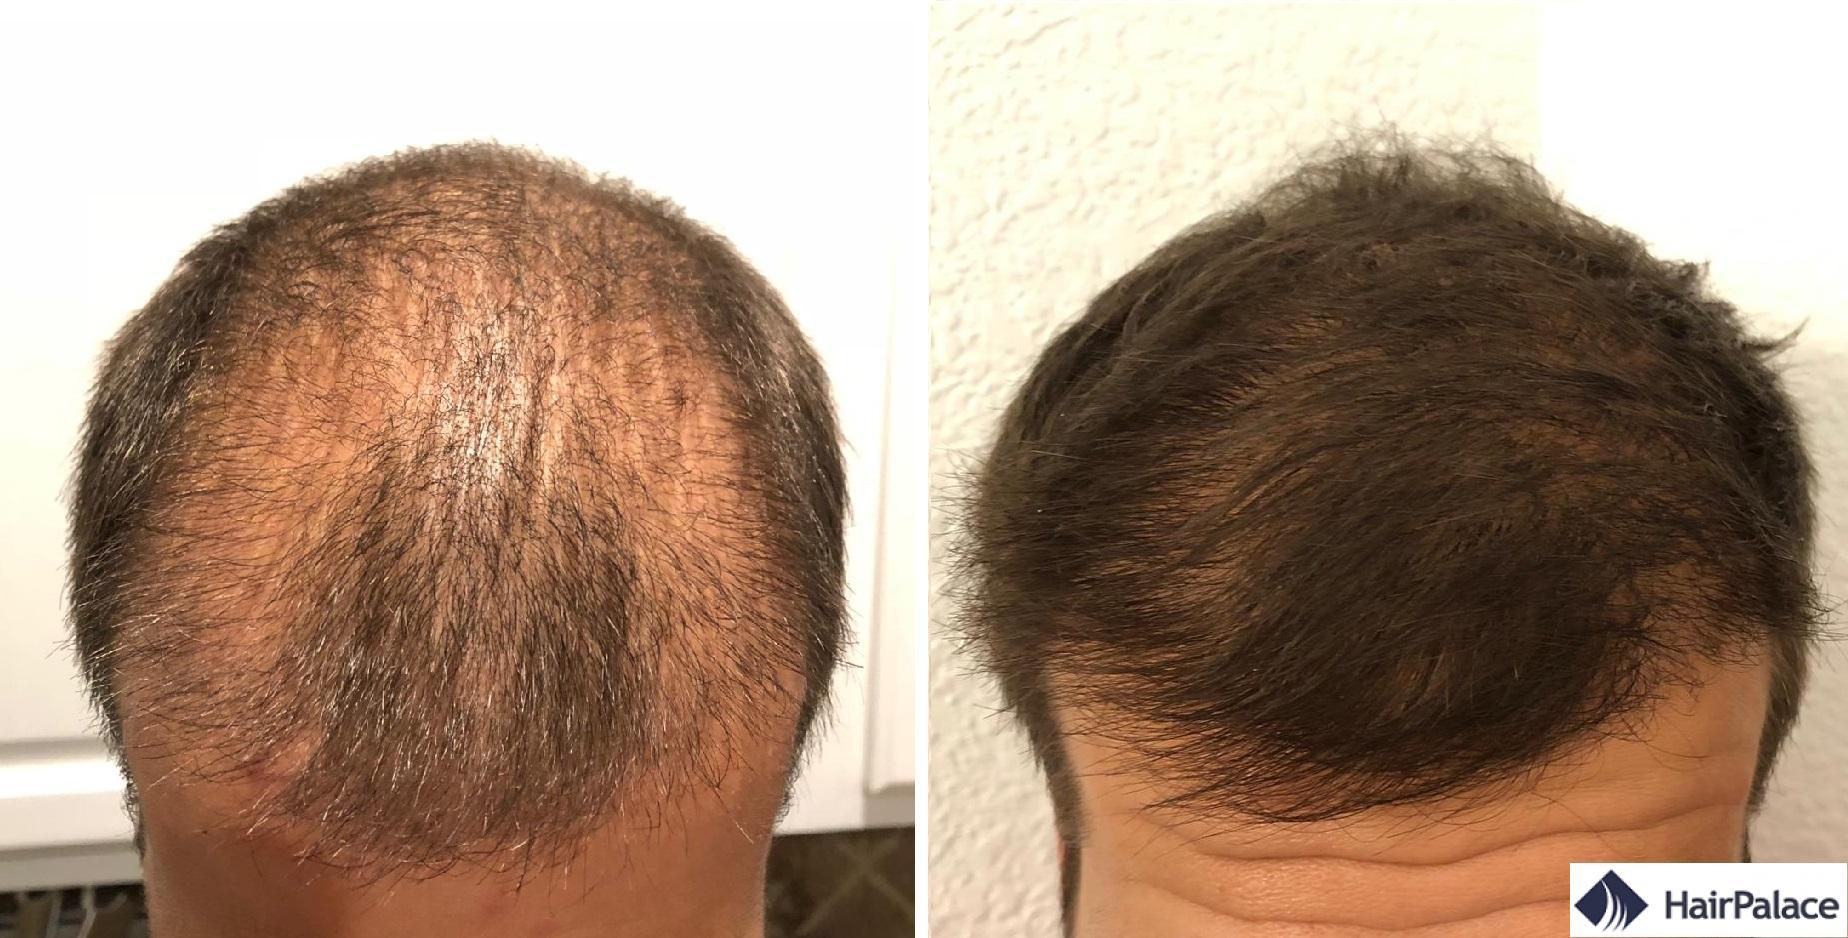 La zone frontale 3 et 6 mois après la greffe